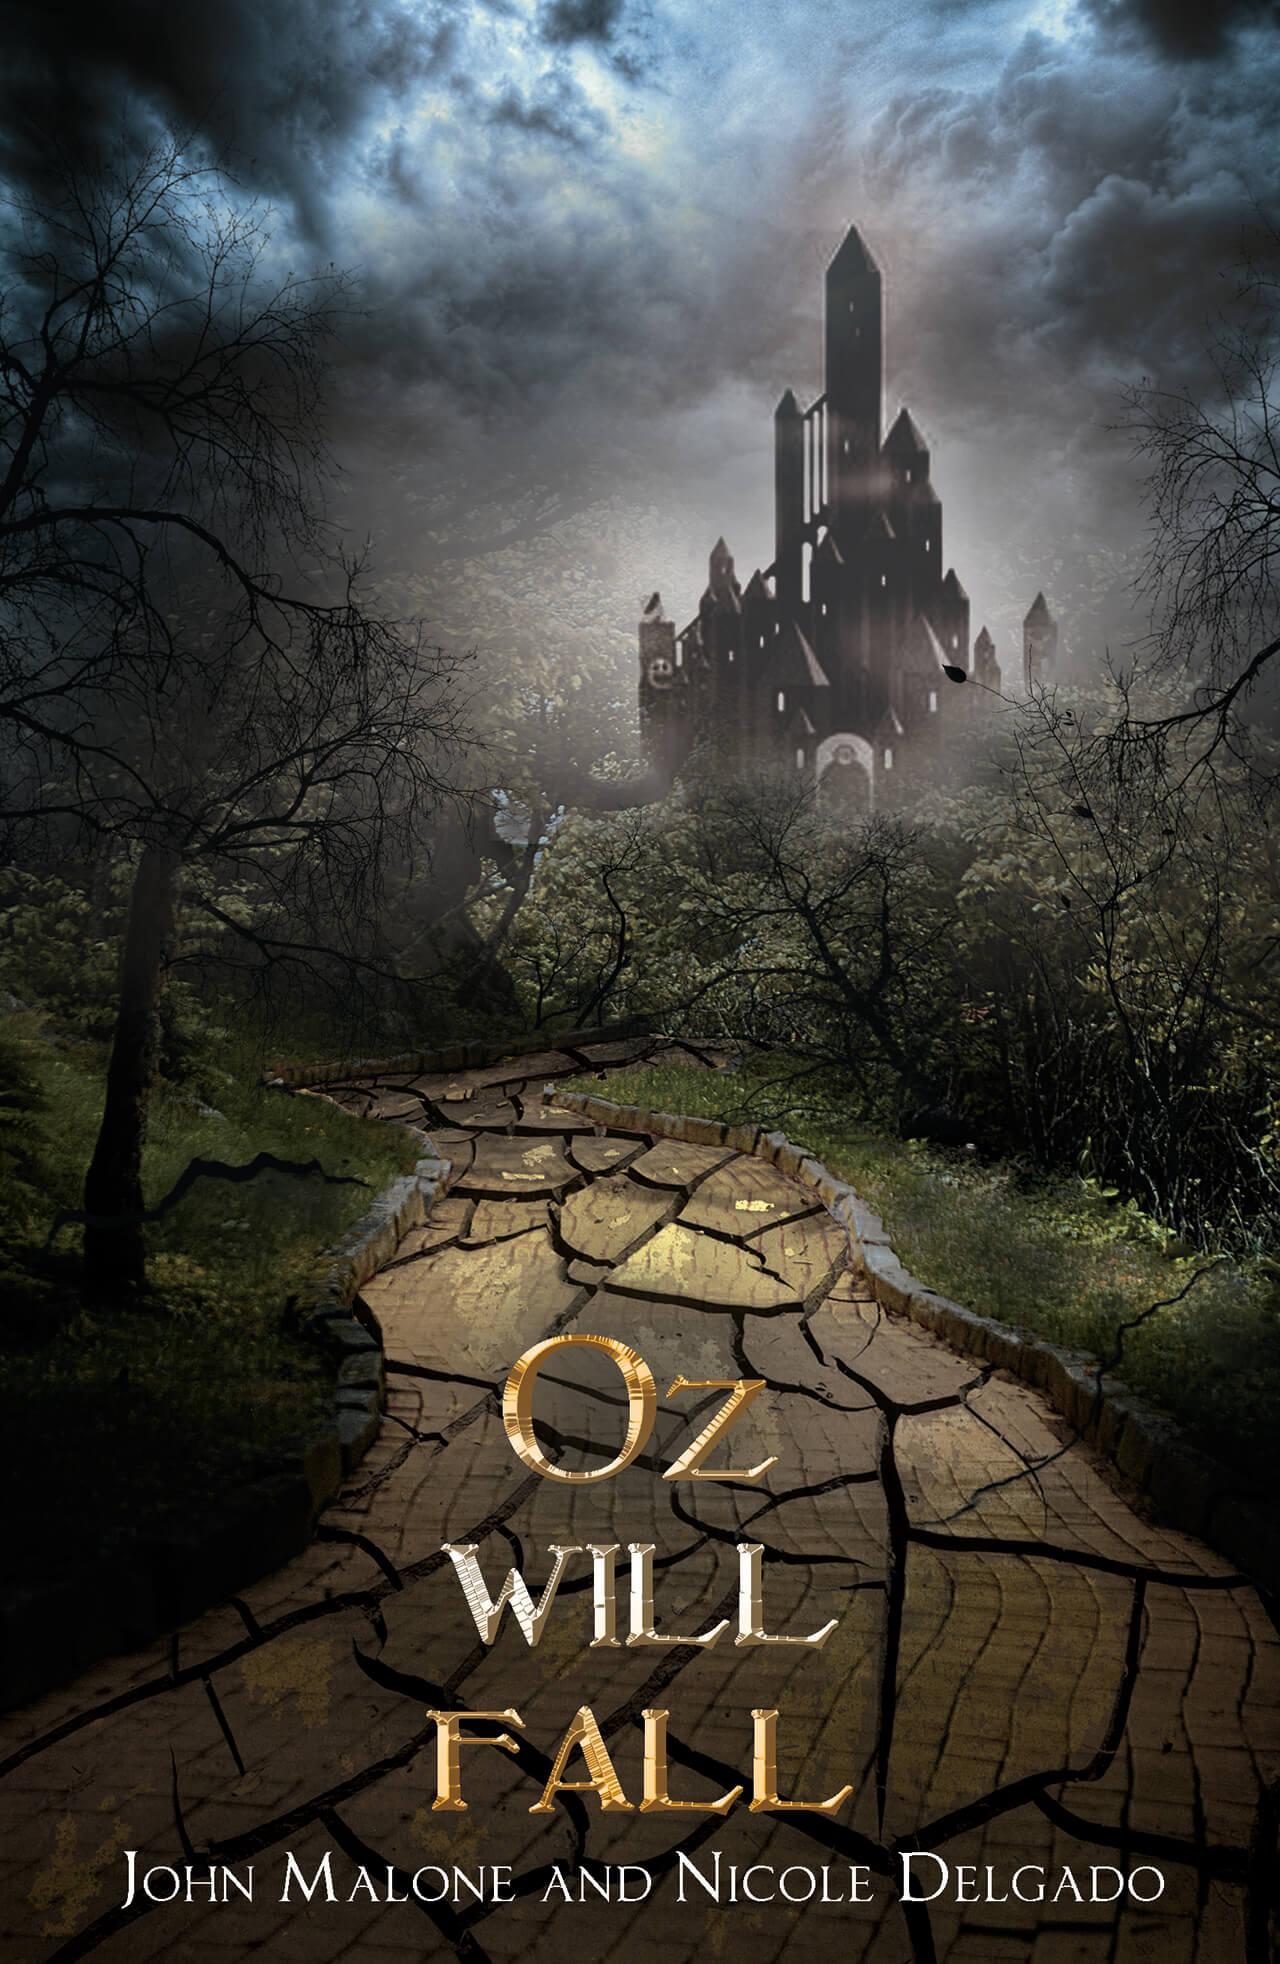 Ozz Will Fall Book Cover